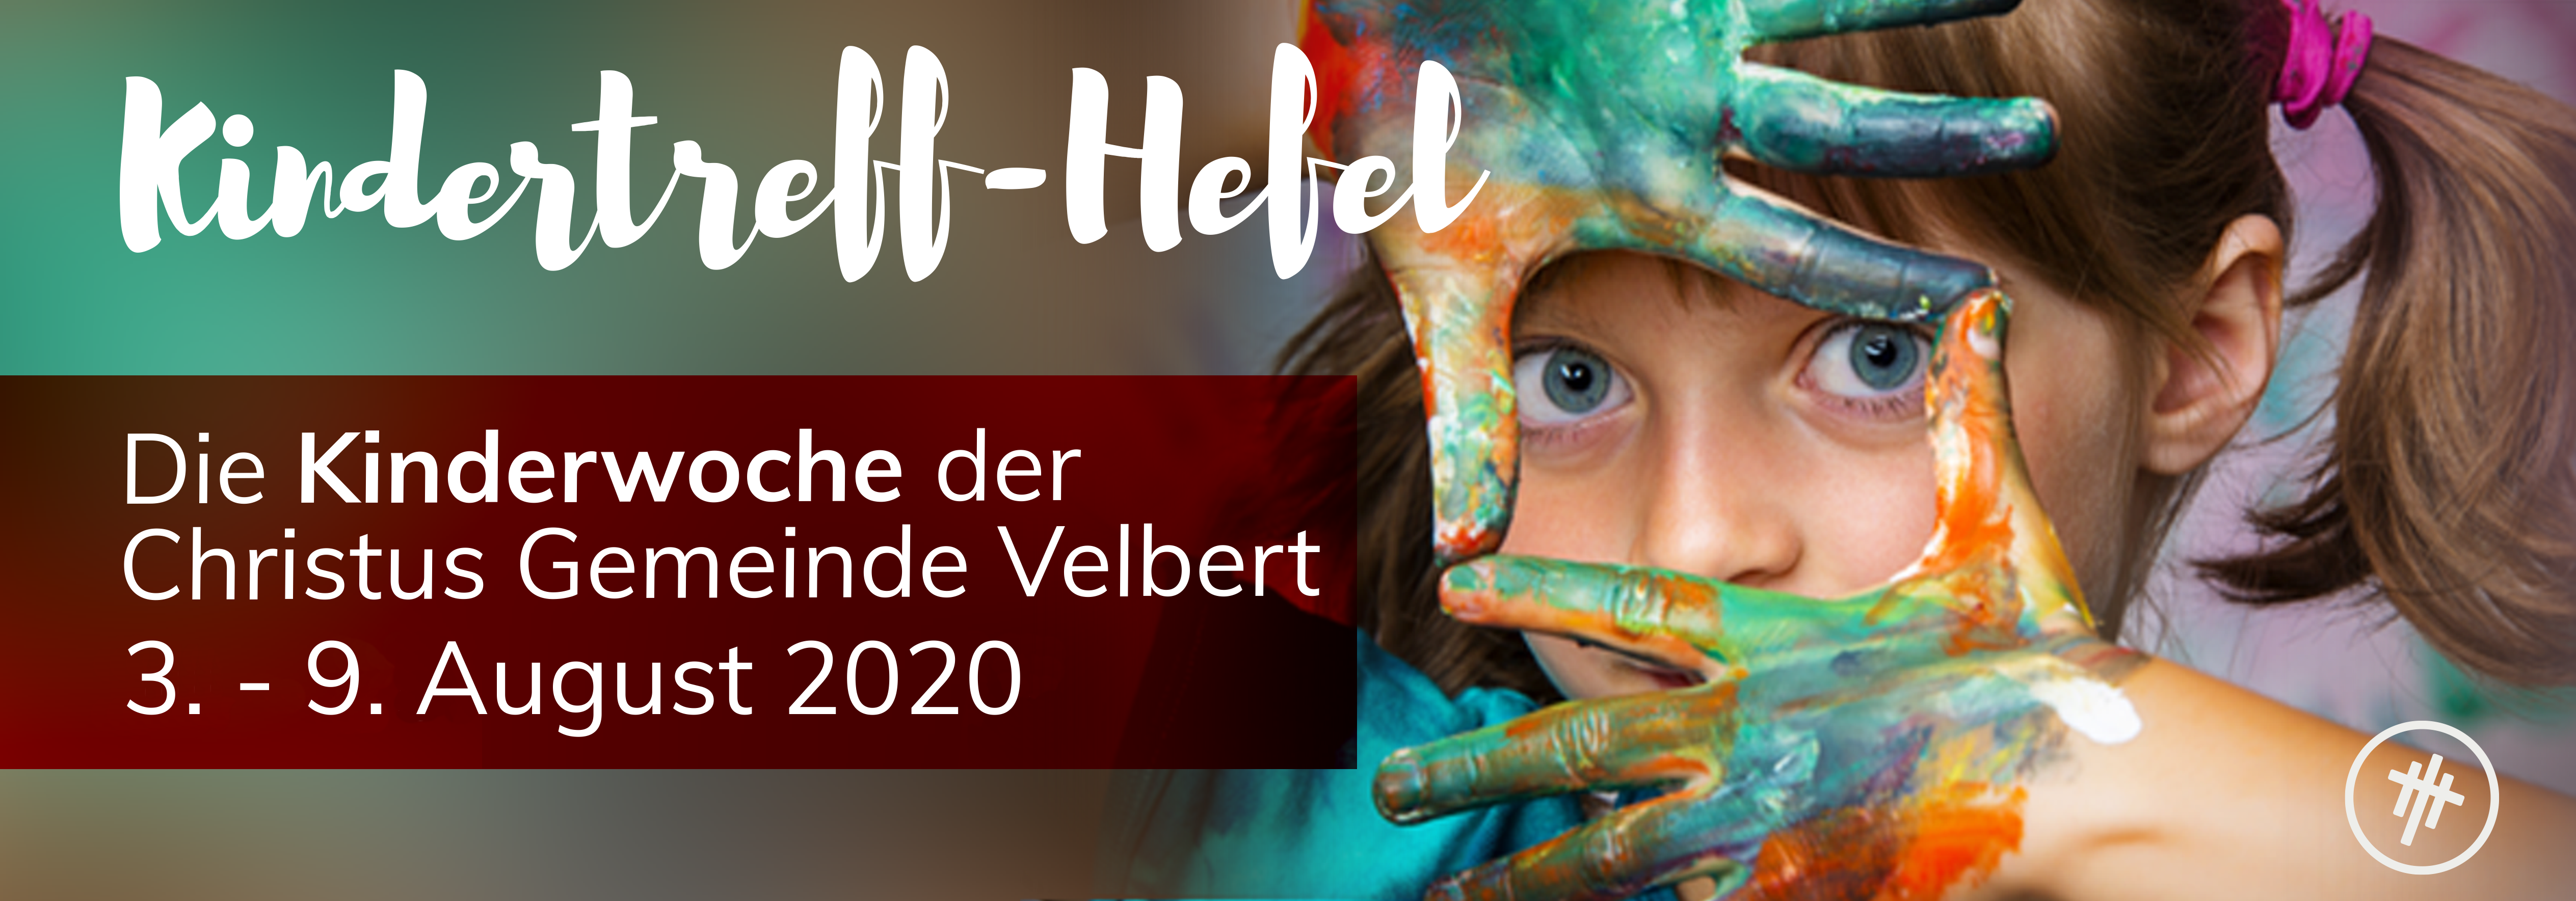 Kindertreff Hefel 2020